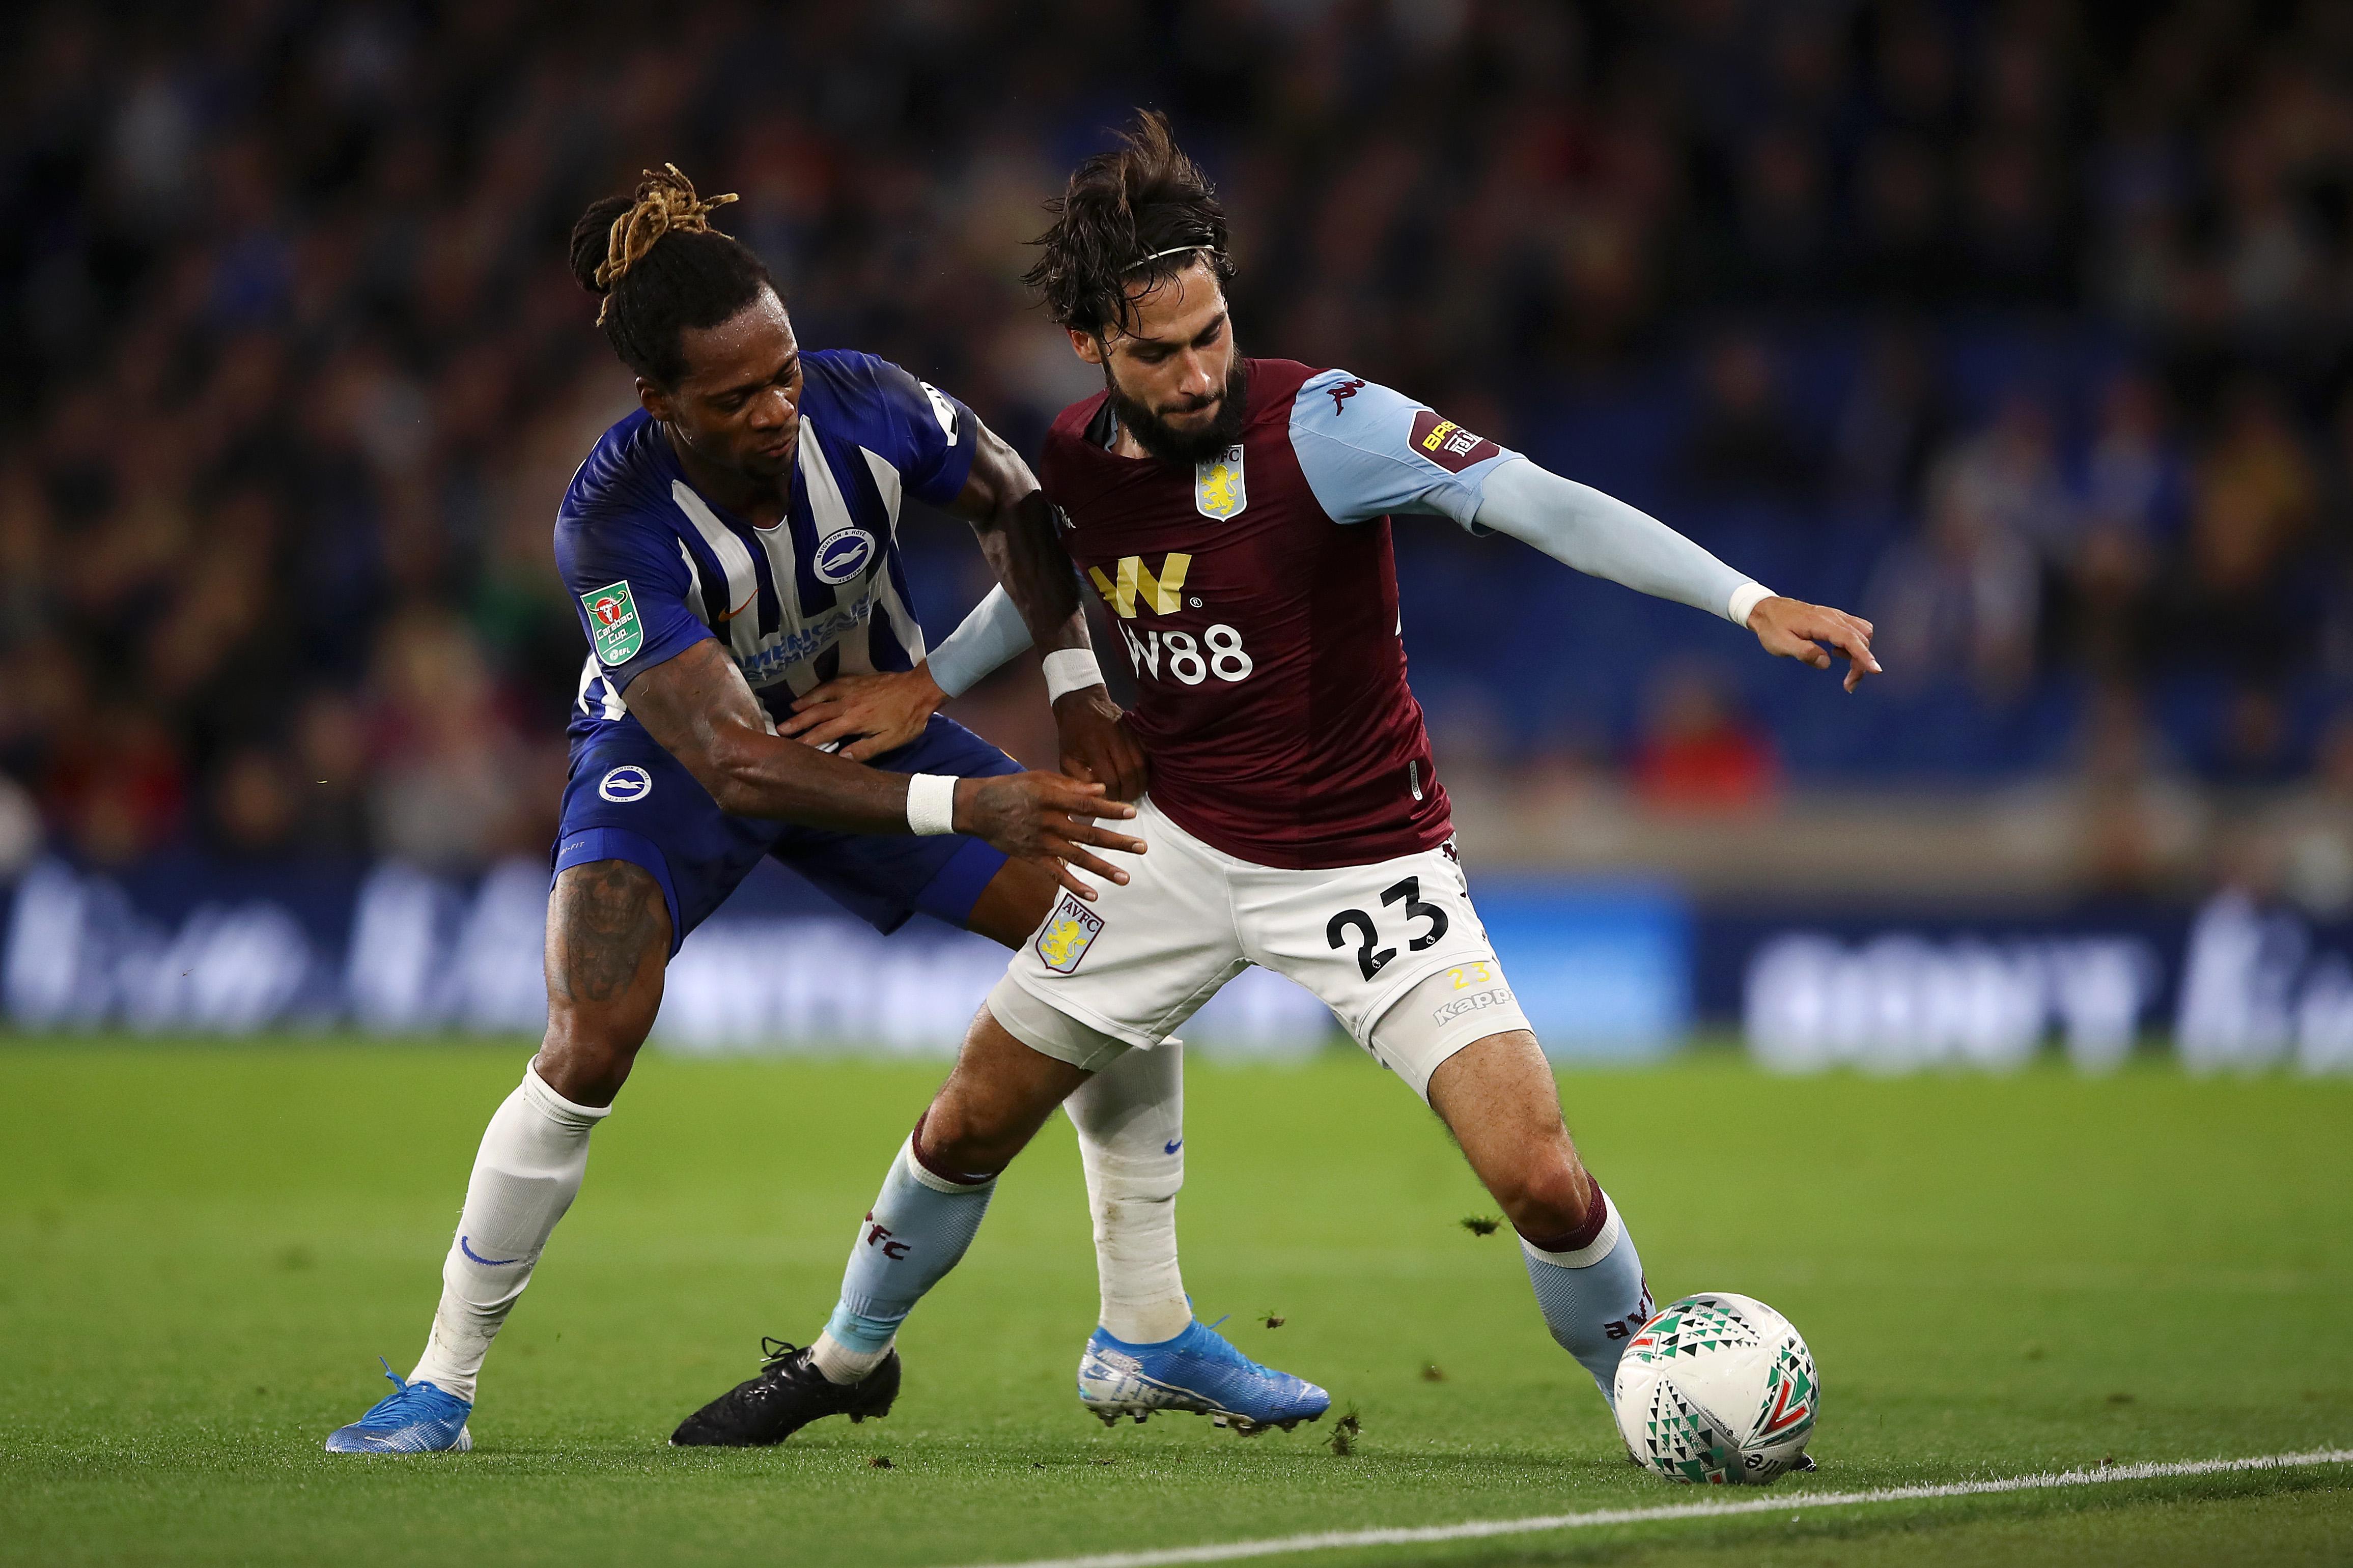 Brighton & Hove Albion v Aston Villa - Carabao Cup Third Round